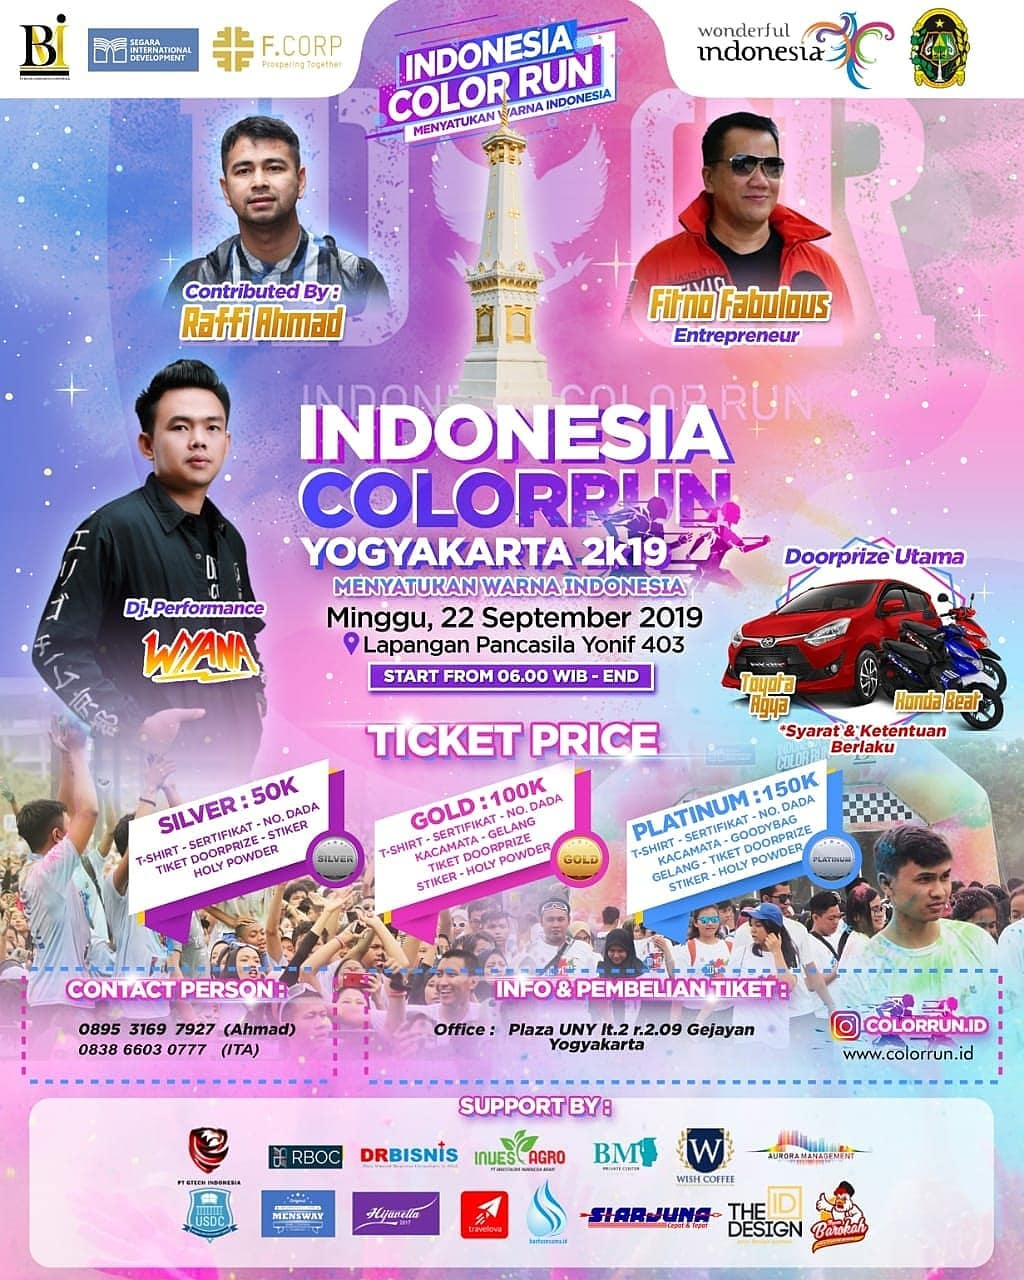 Indonesia Color Run - Yogyakarta • 2019